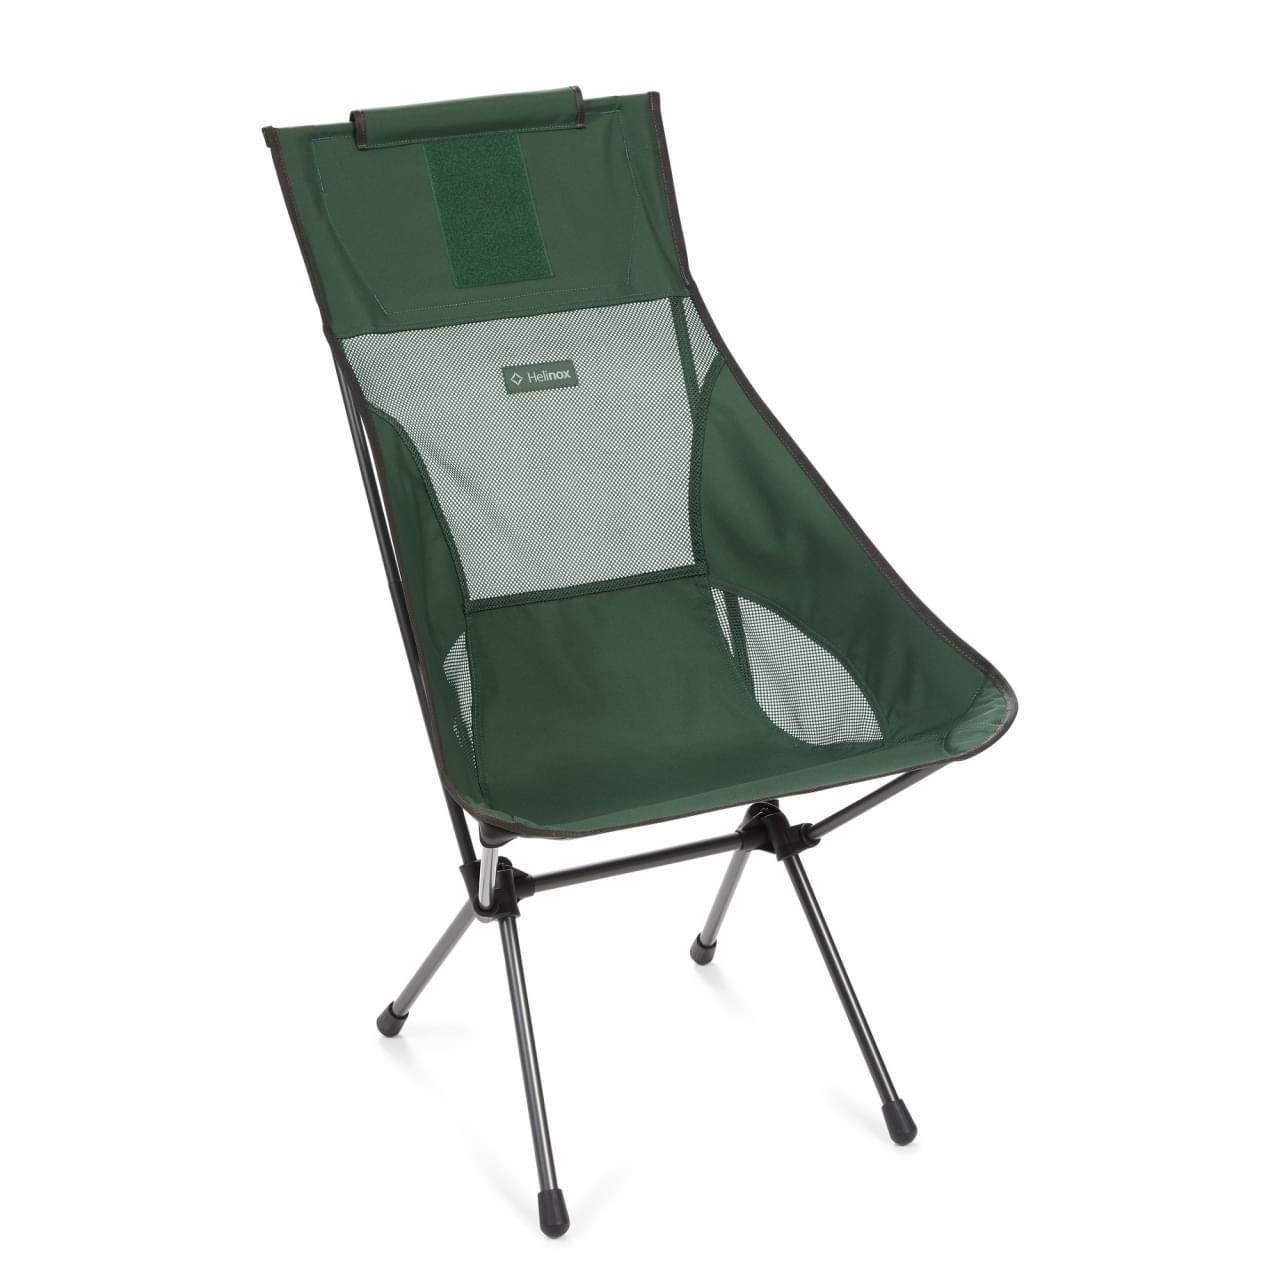 Helinox Sunset Chair Lichtgewicht Stoel - Groen